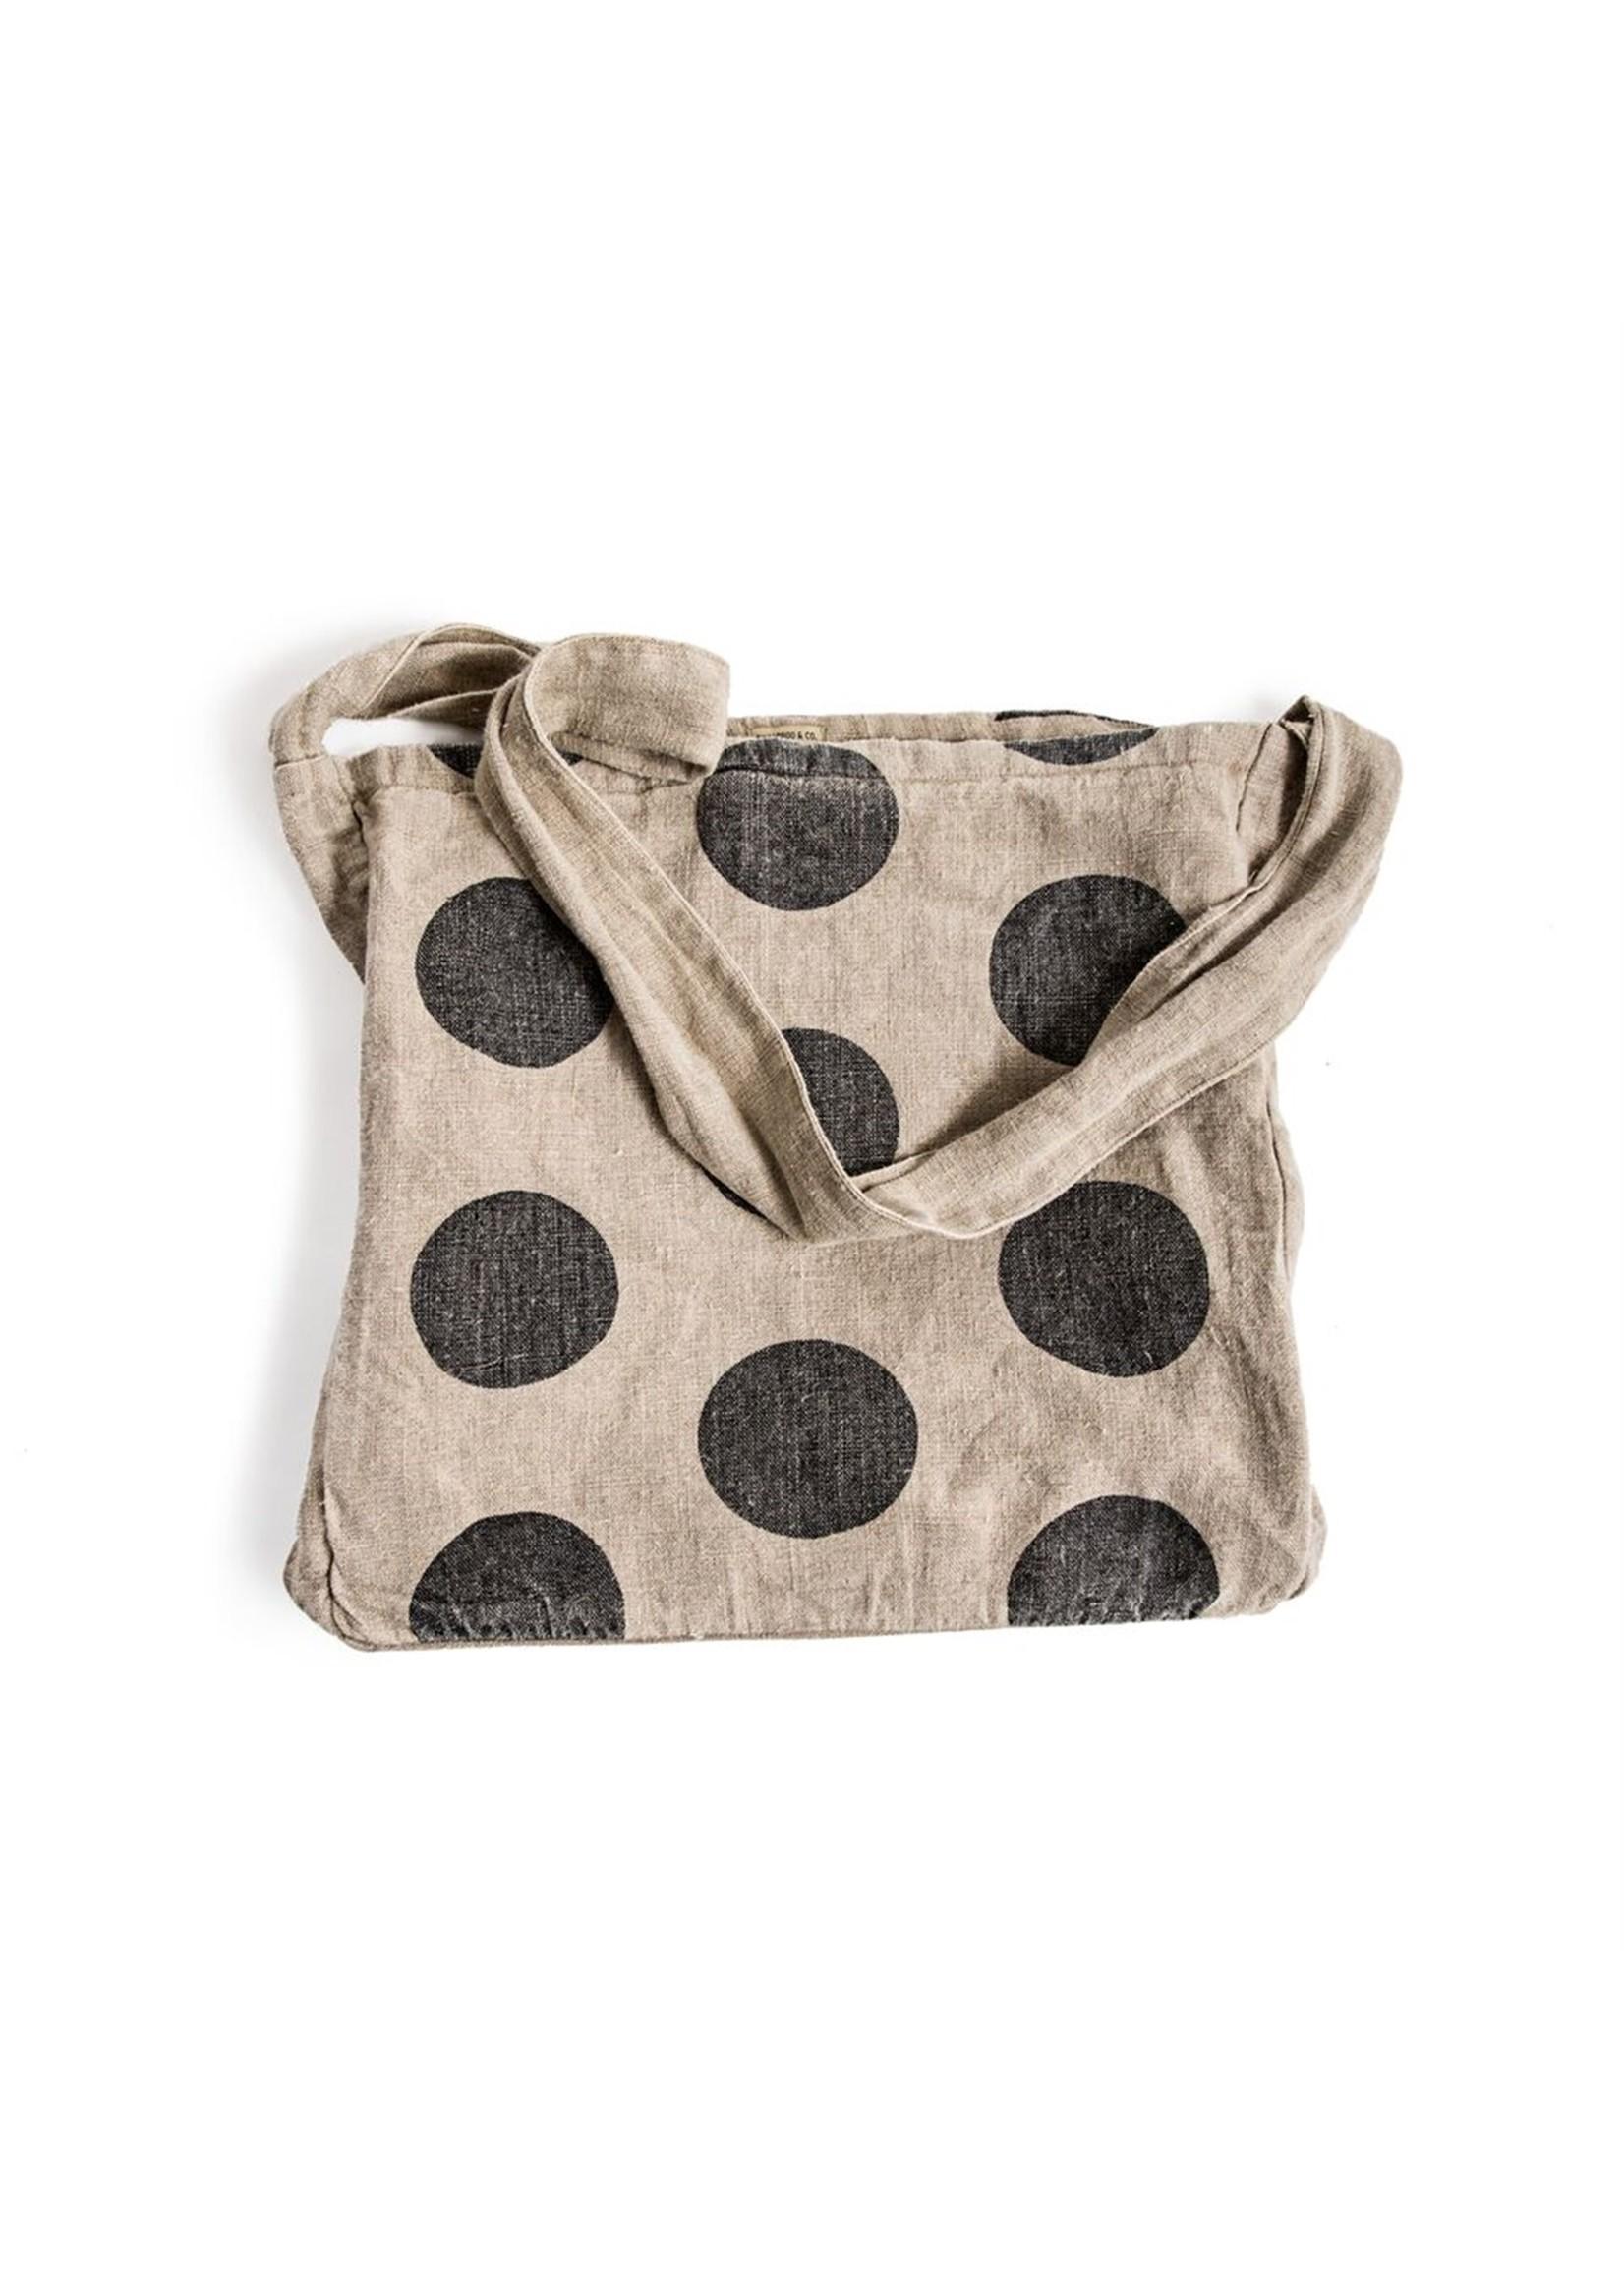 Polka Dot Messenger Bag